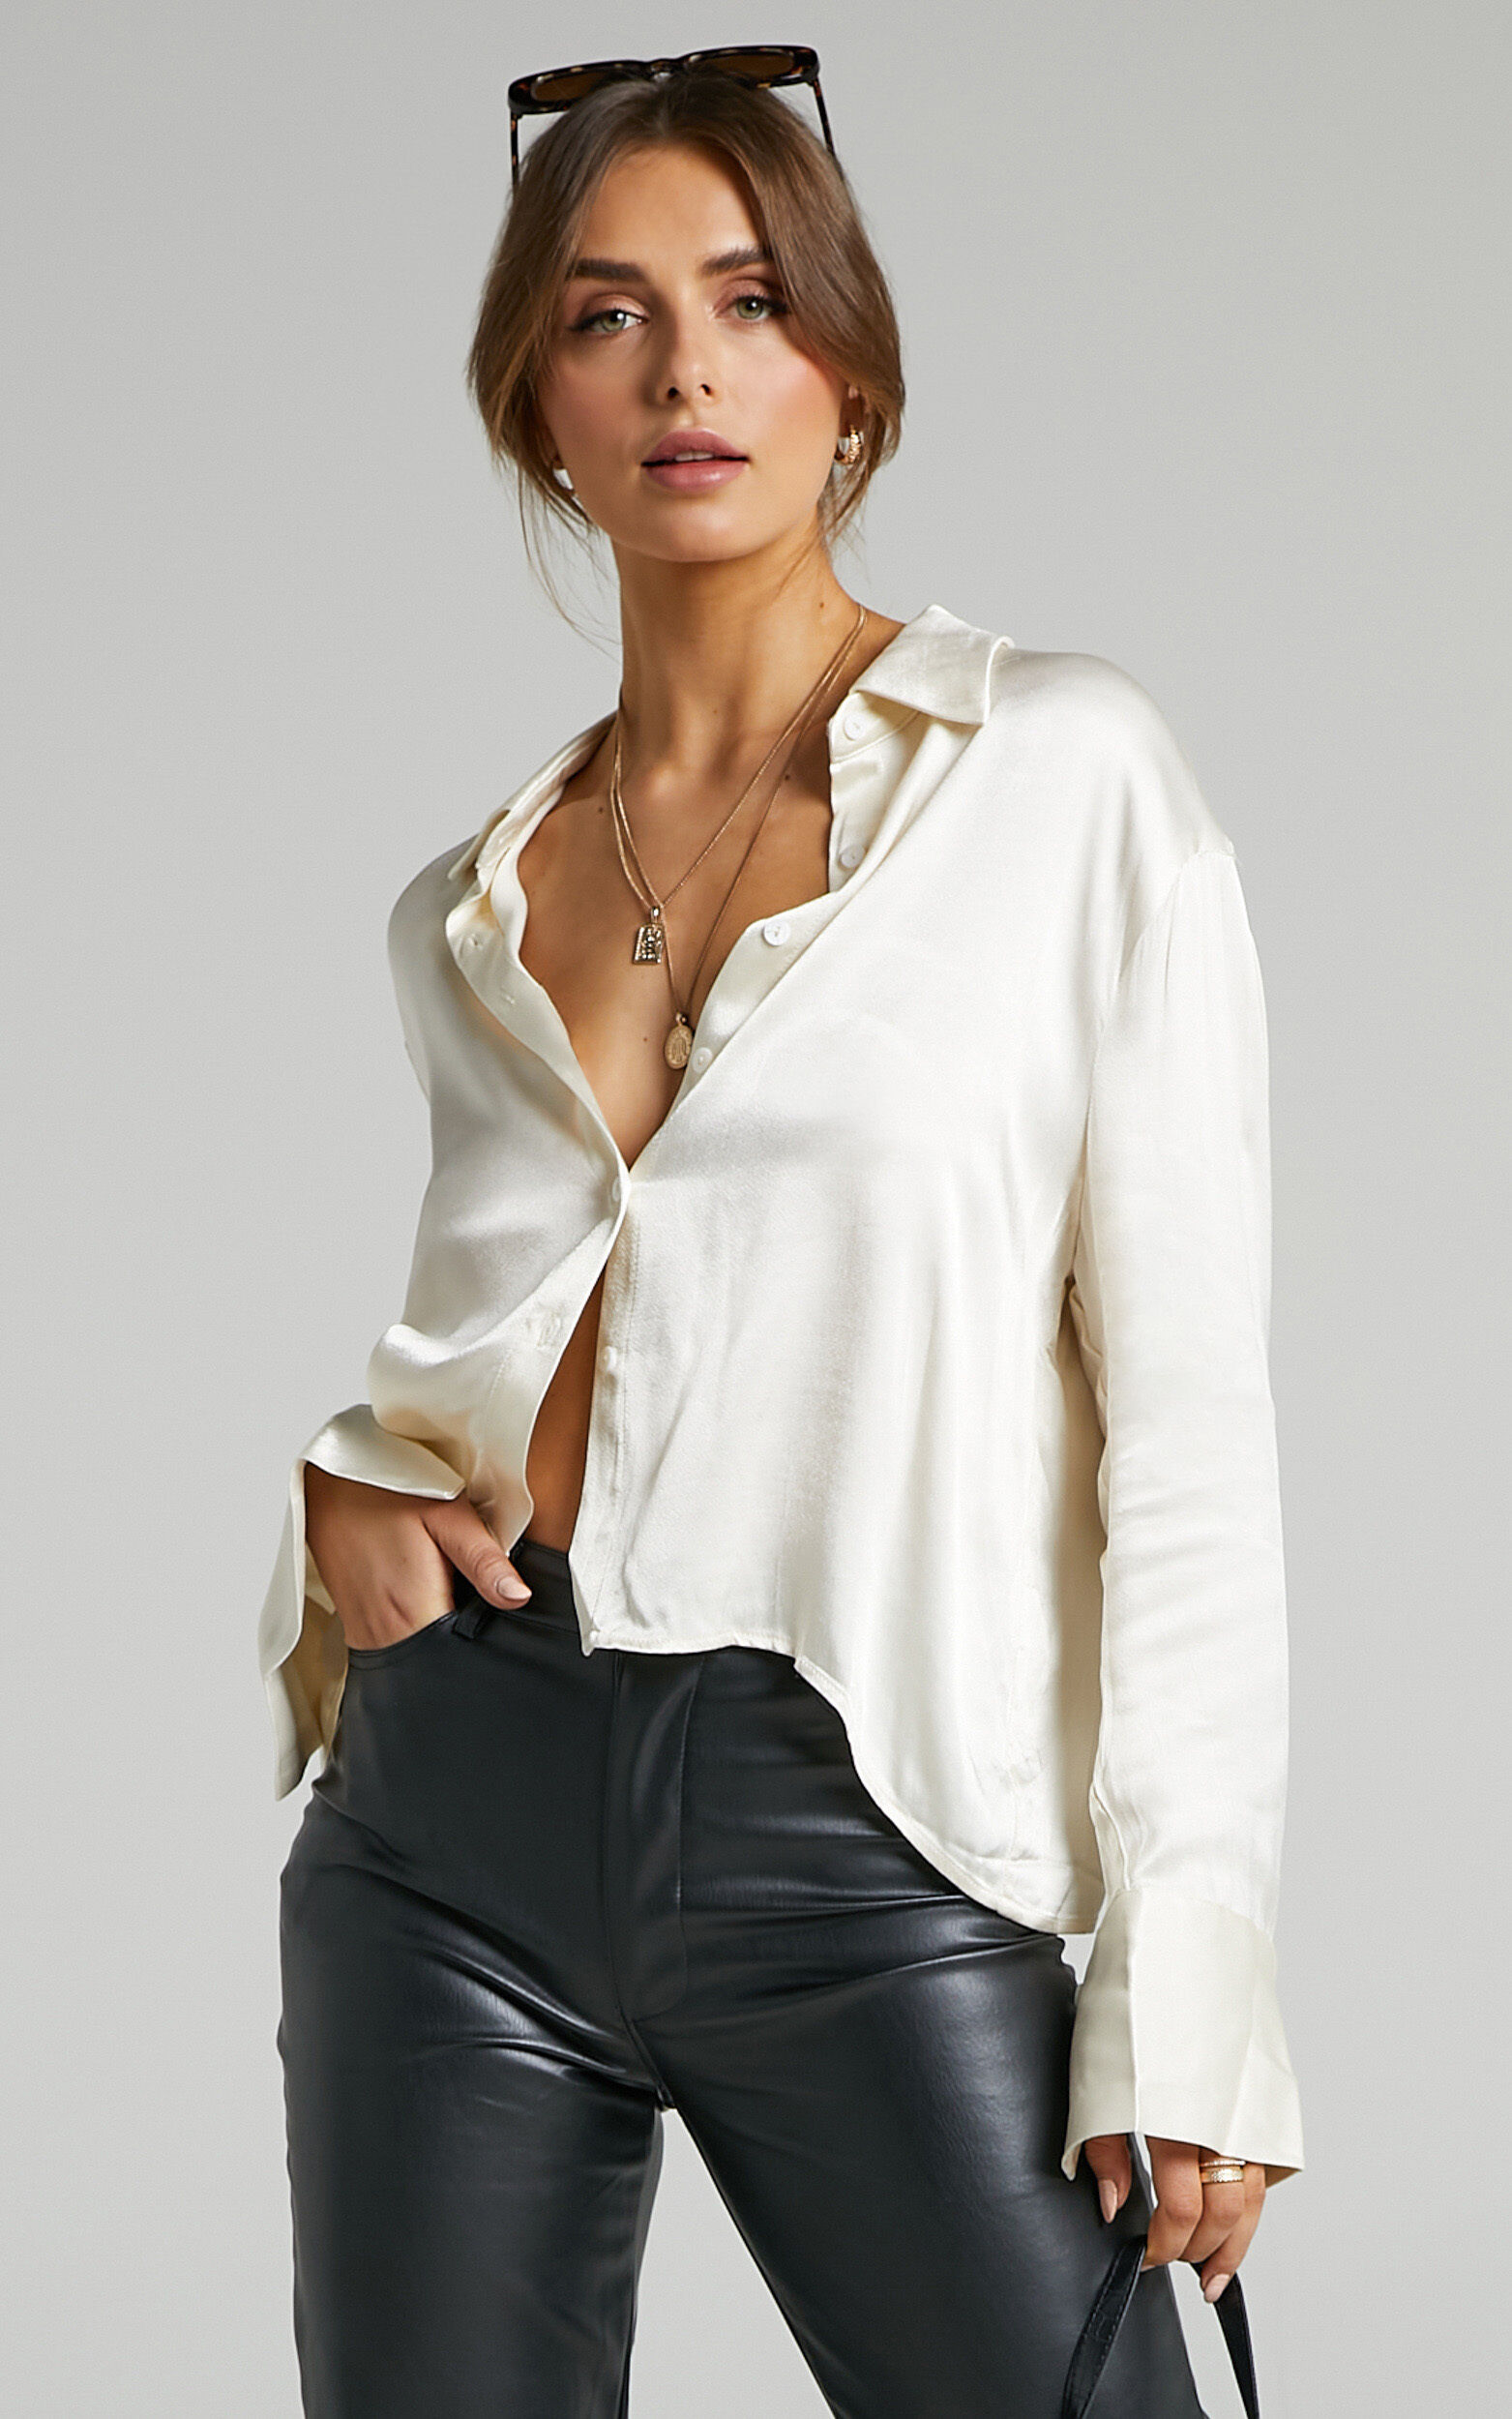 SNDYS - Rising Star Satin Shirt in Champagne - L, NEU2, super-hi-res image number null